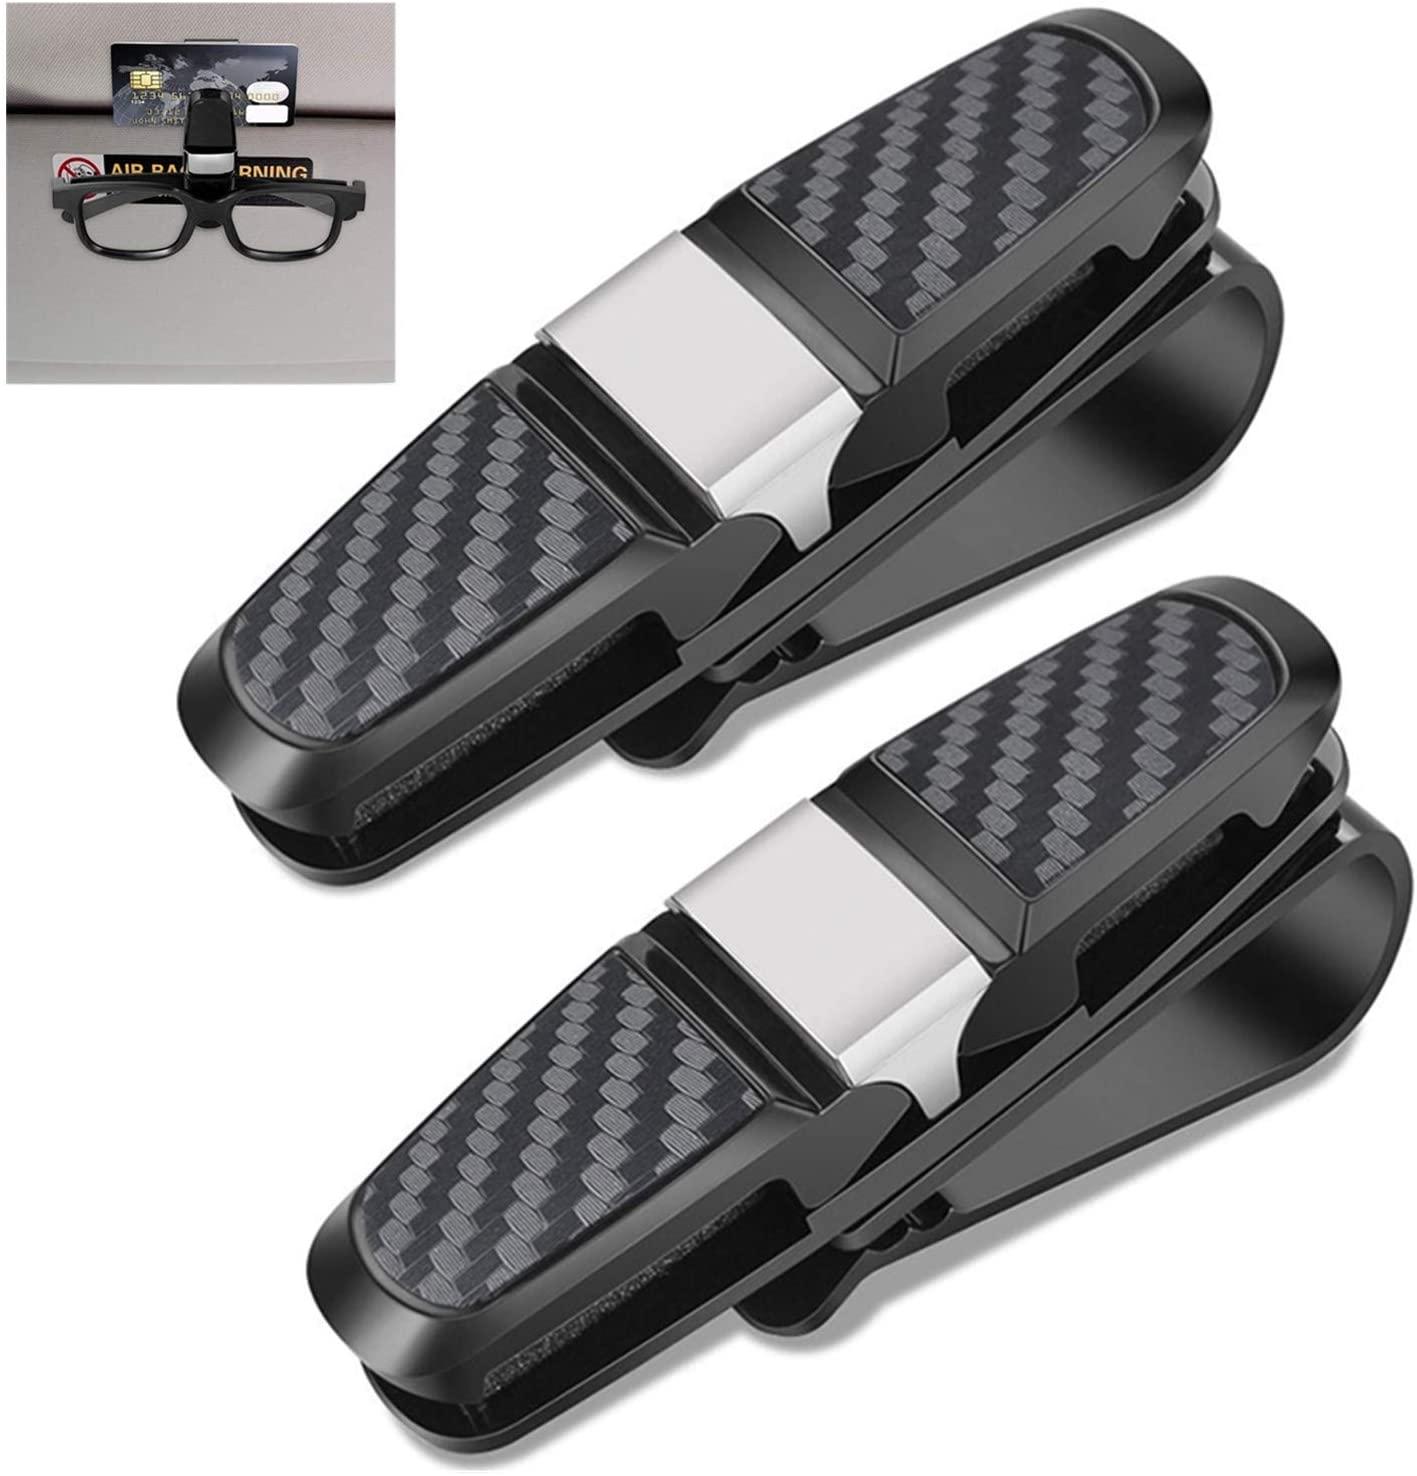 2 Packs Glasses Holders for Car Sun Visor, Sunglasses Holder Clip Hanger Eyeglasses Mount with Ticket Card Clip, Double-Ends Clip and 180 Degree Rotational Car Glasses Holder